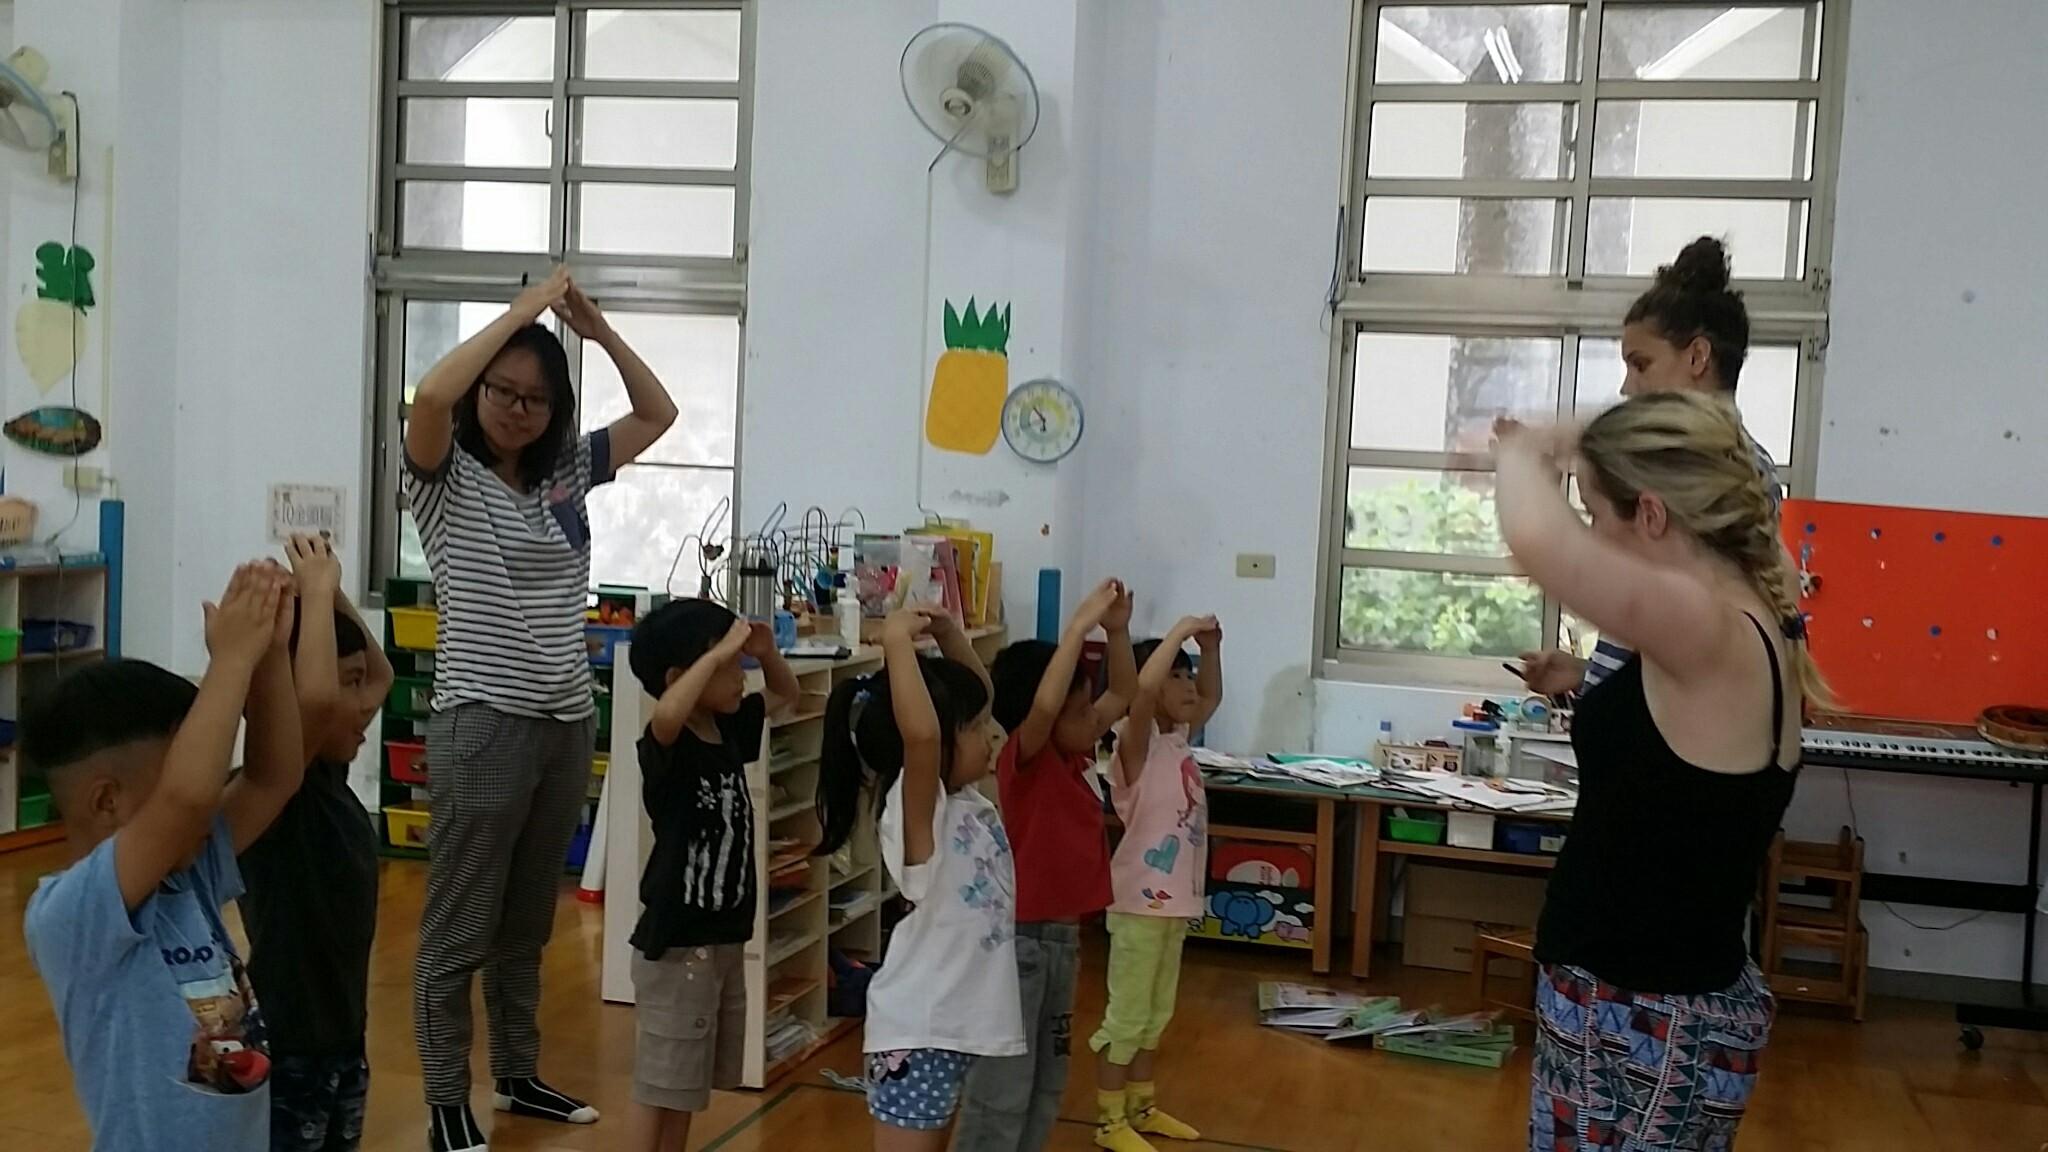 http://www.tses.cyc.edu.tw/uploads/tadgallery/2017_06_30/3852_國際志工幼兒園_170630_0013.jpg